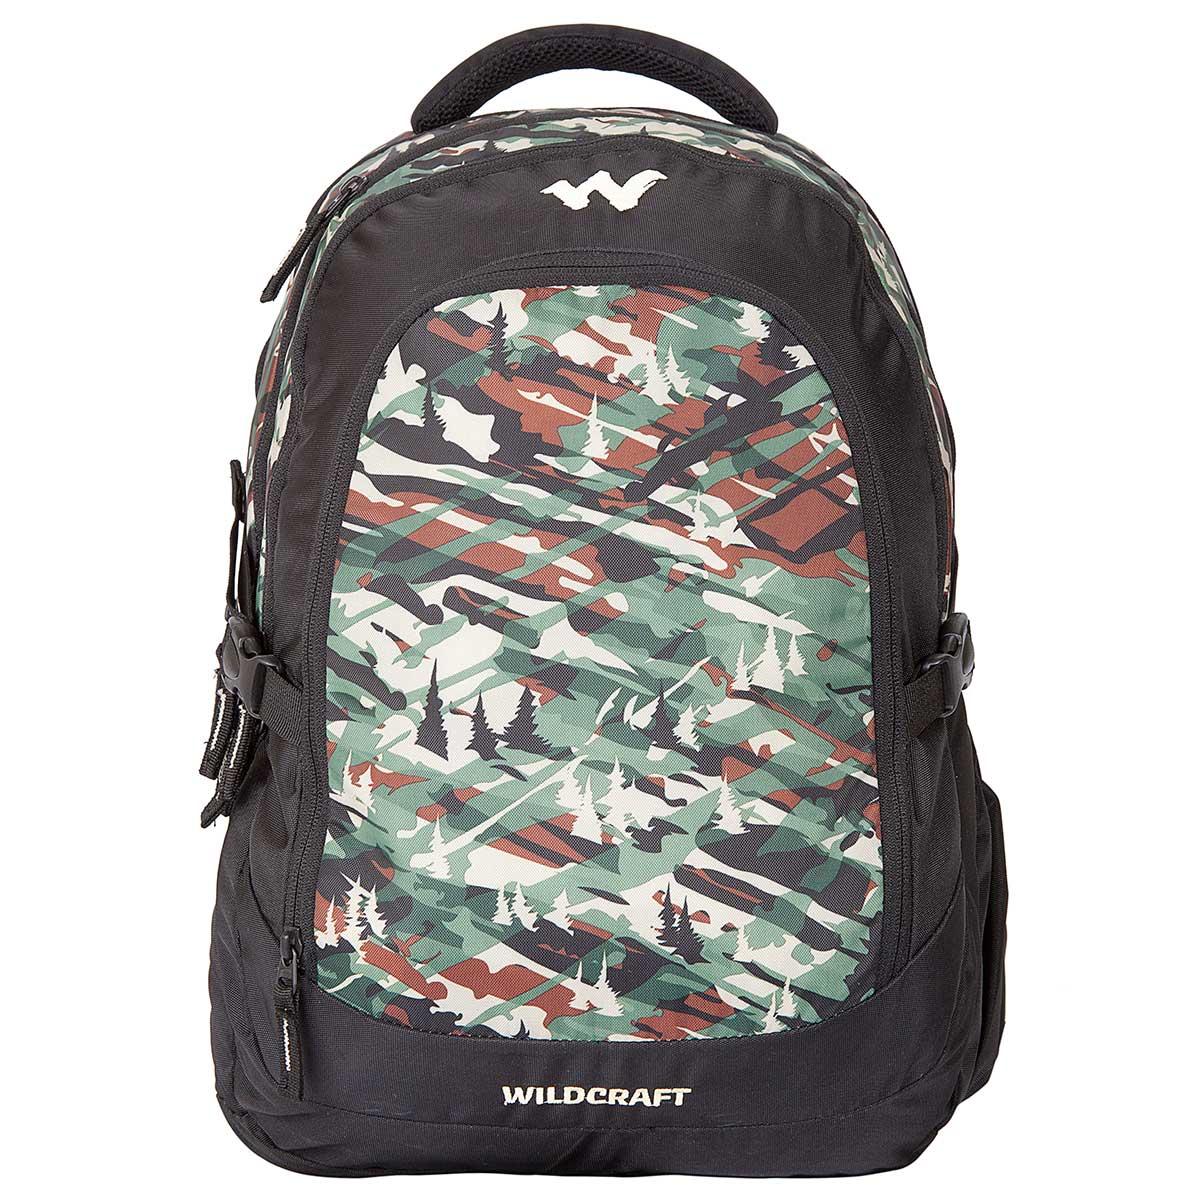 Buy Wildcraft Camo 4 Backpack (Green) Online in India 062c97ebb87af